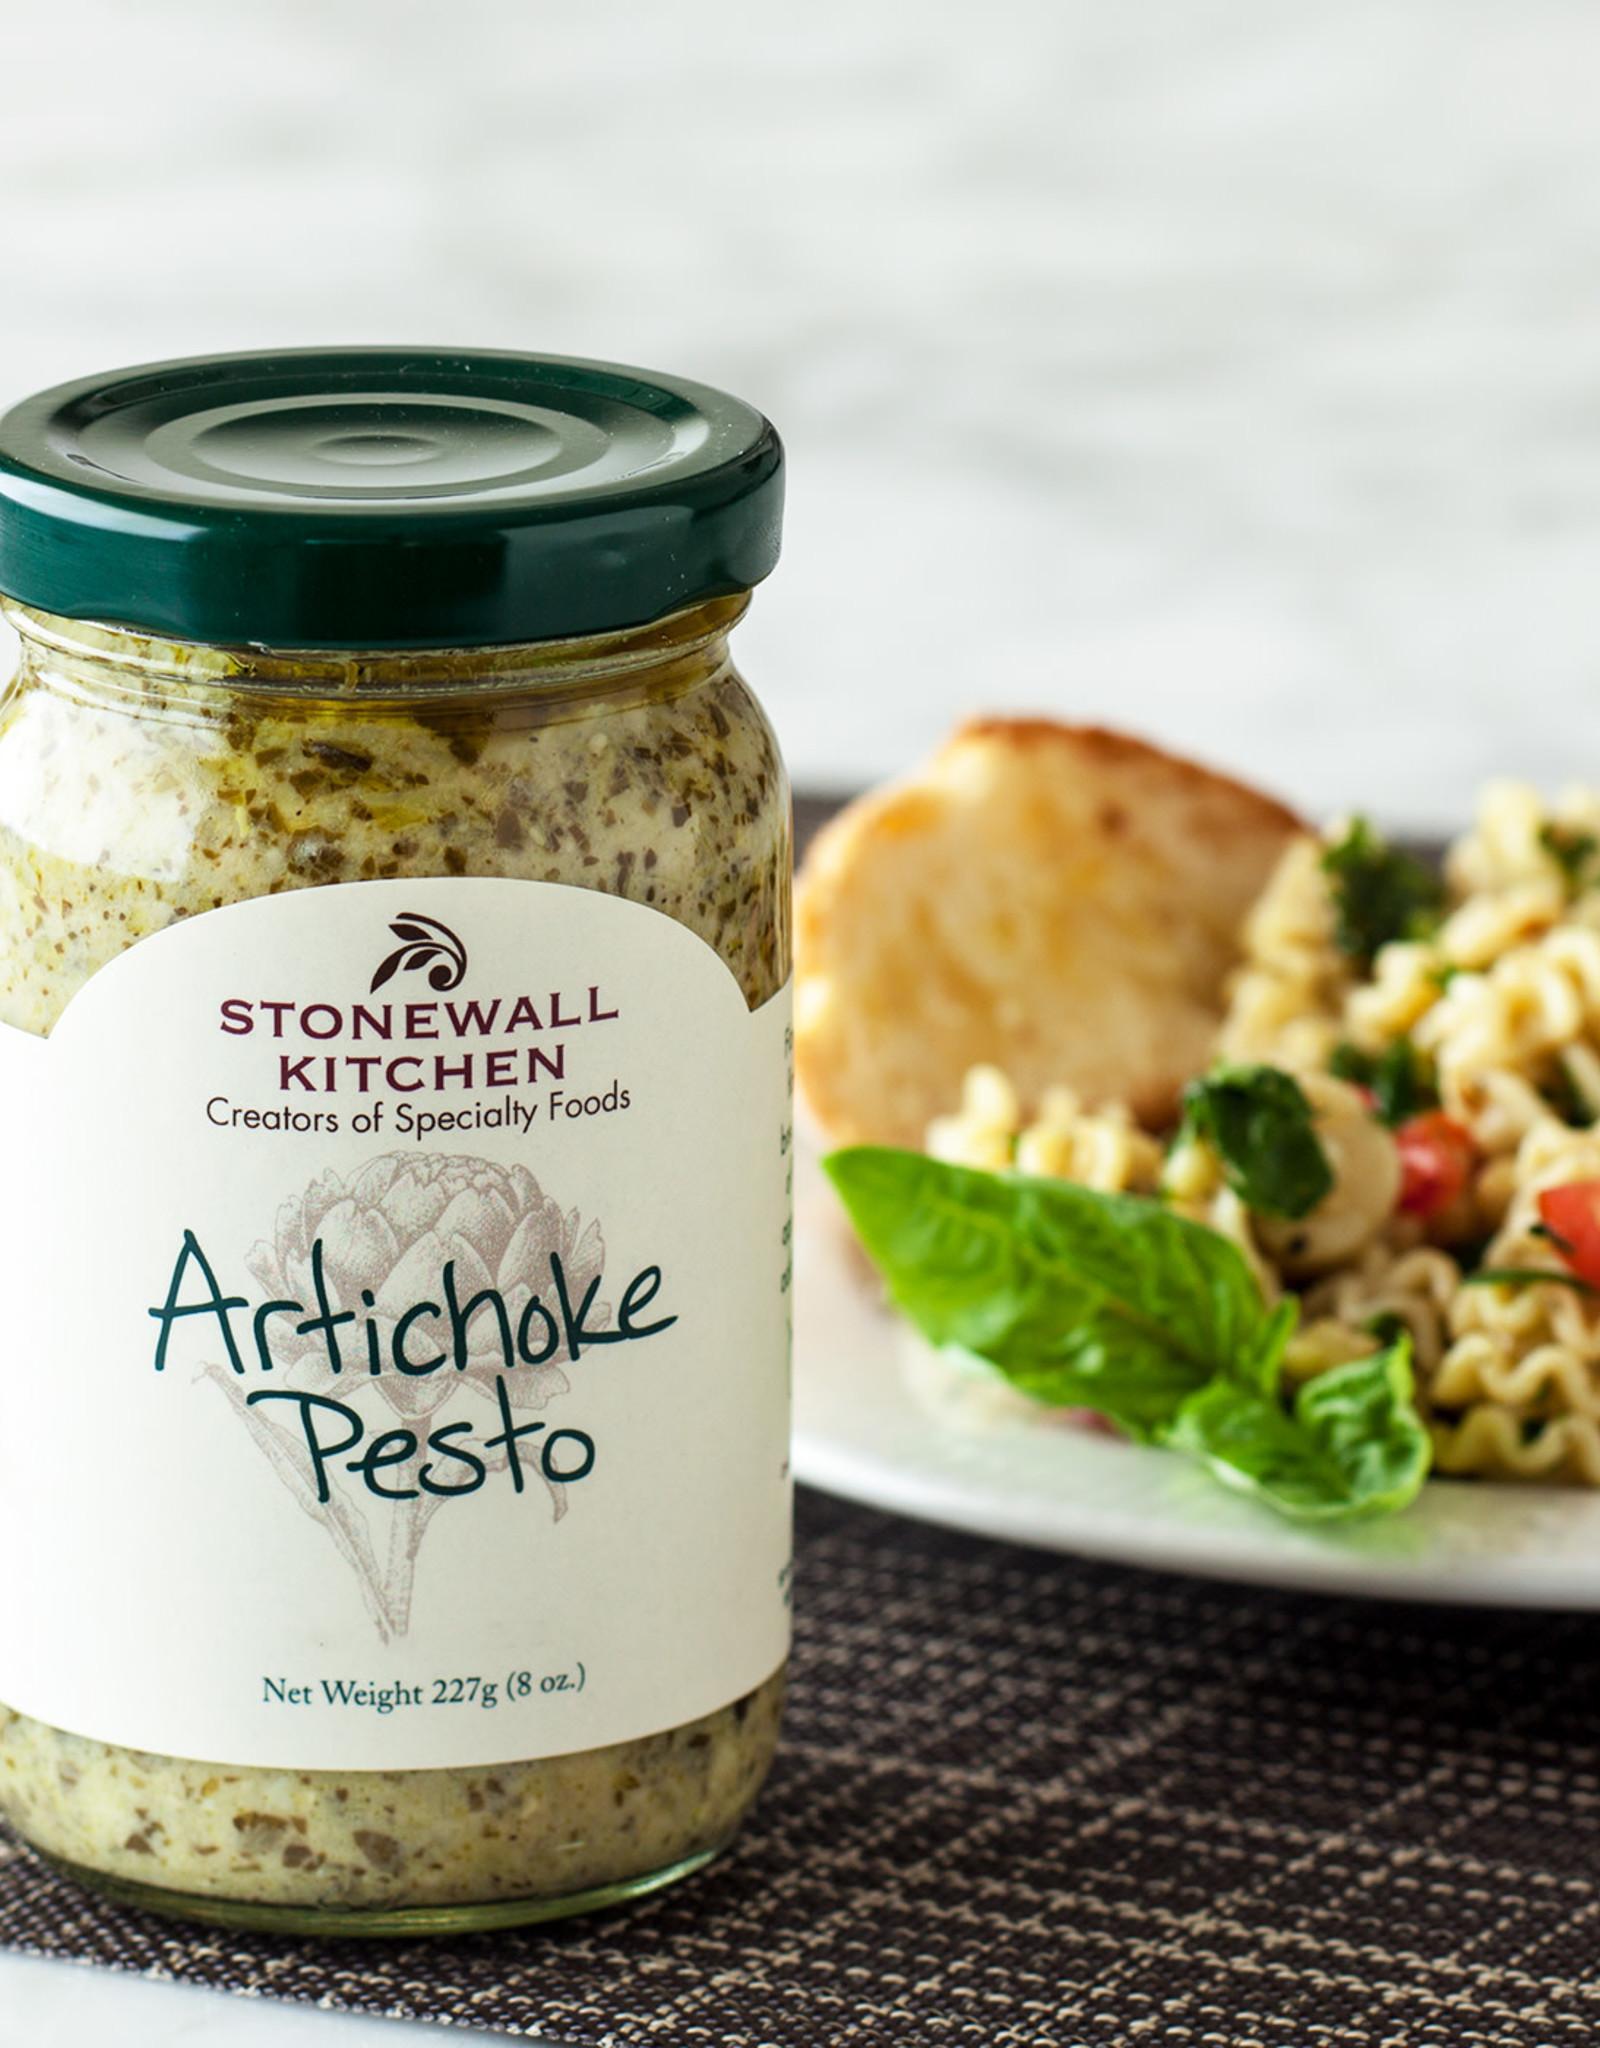 Stonewall Kitchen Artichoke Pesto